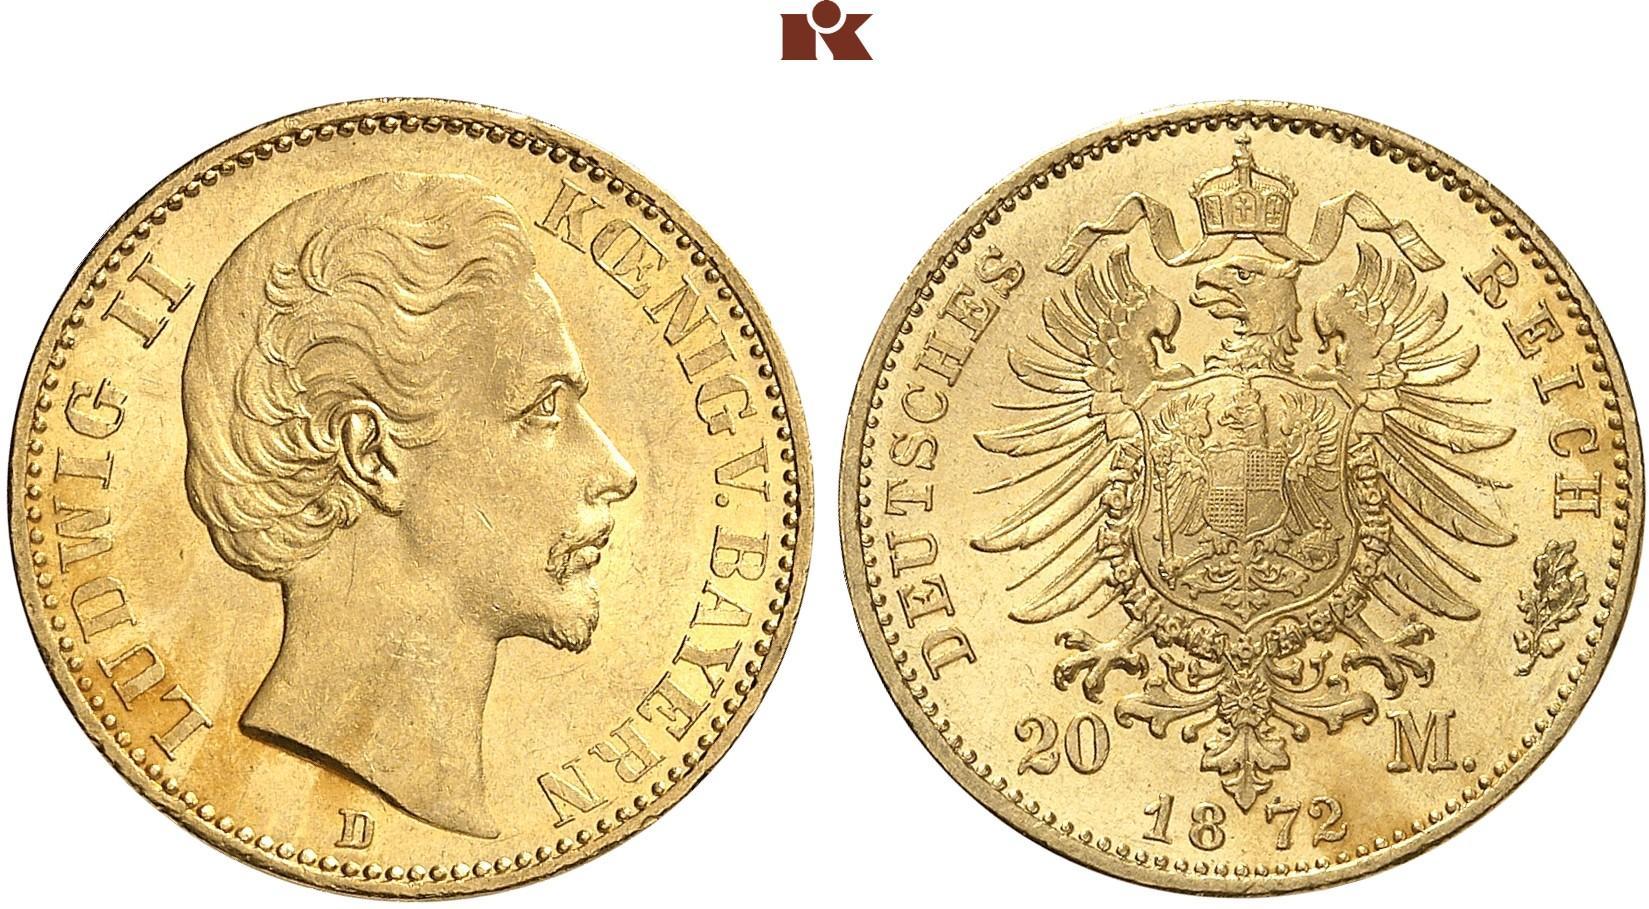 DE 20 Mark 1872 D